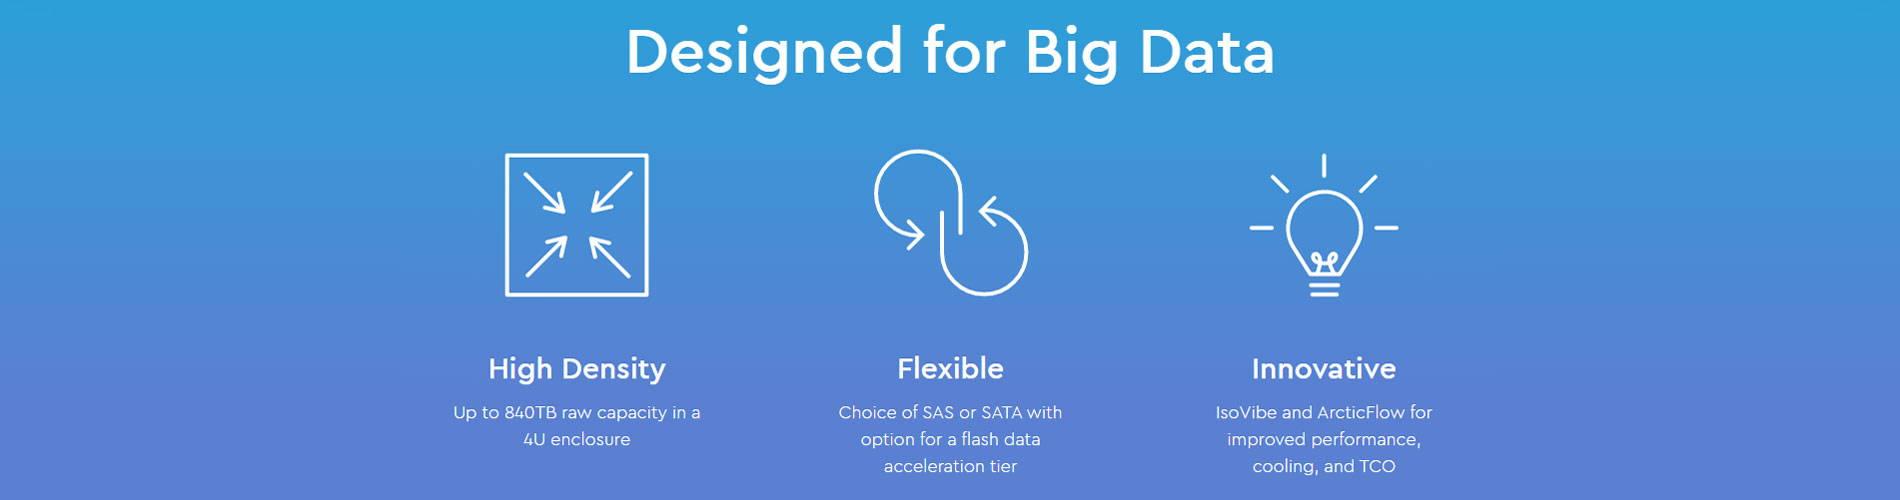 Designed for Big Data